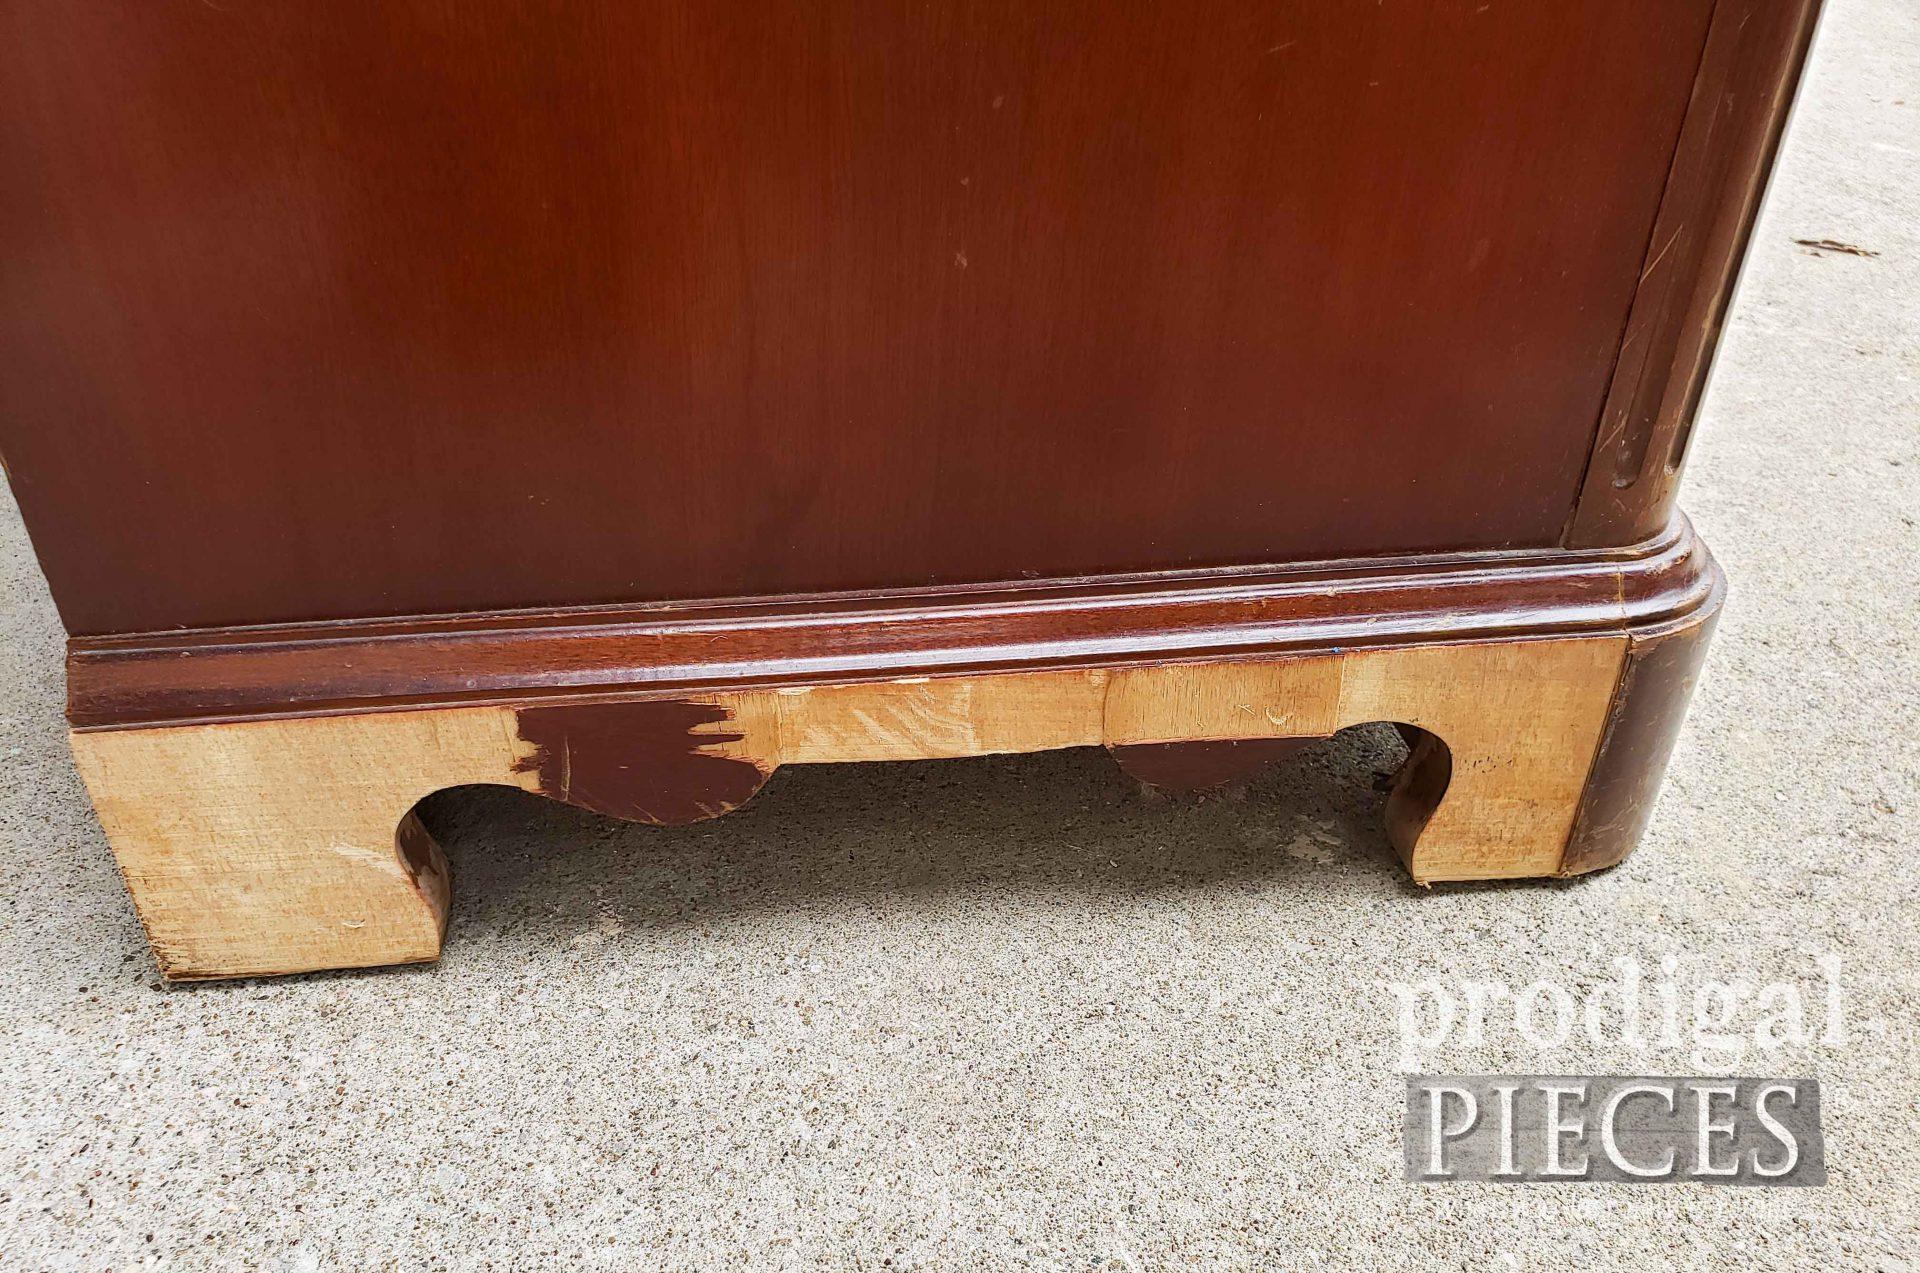 Damaged Left Side of Serpentine Dresser | prodigalpieces.com